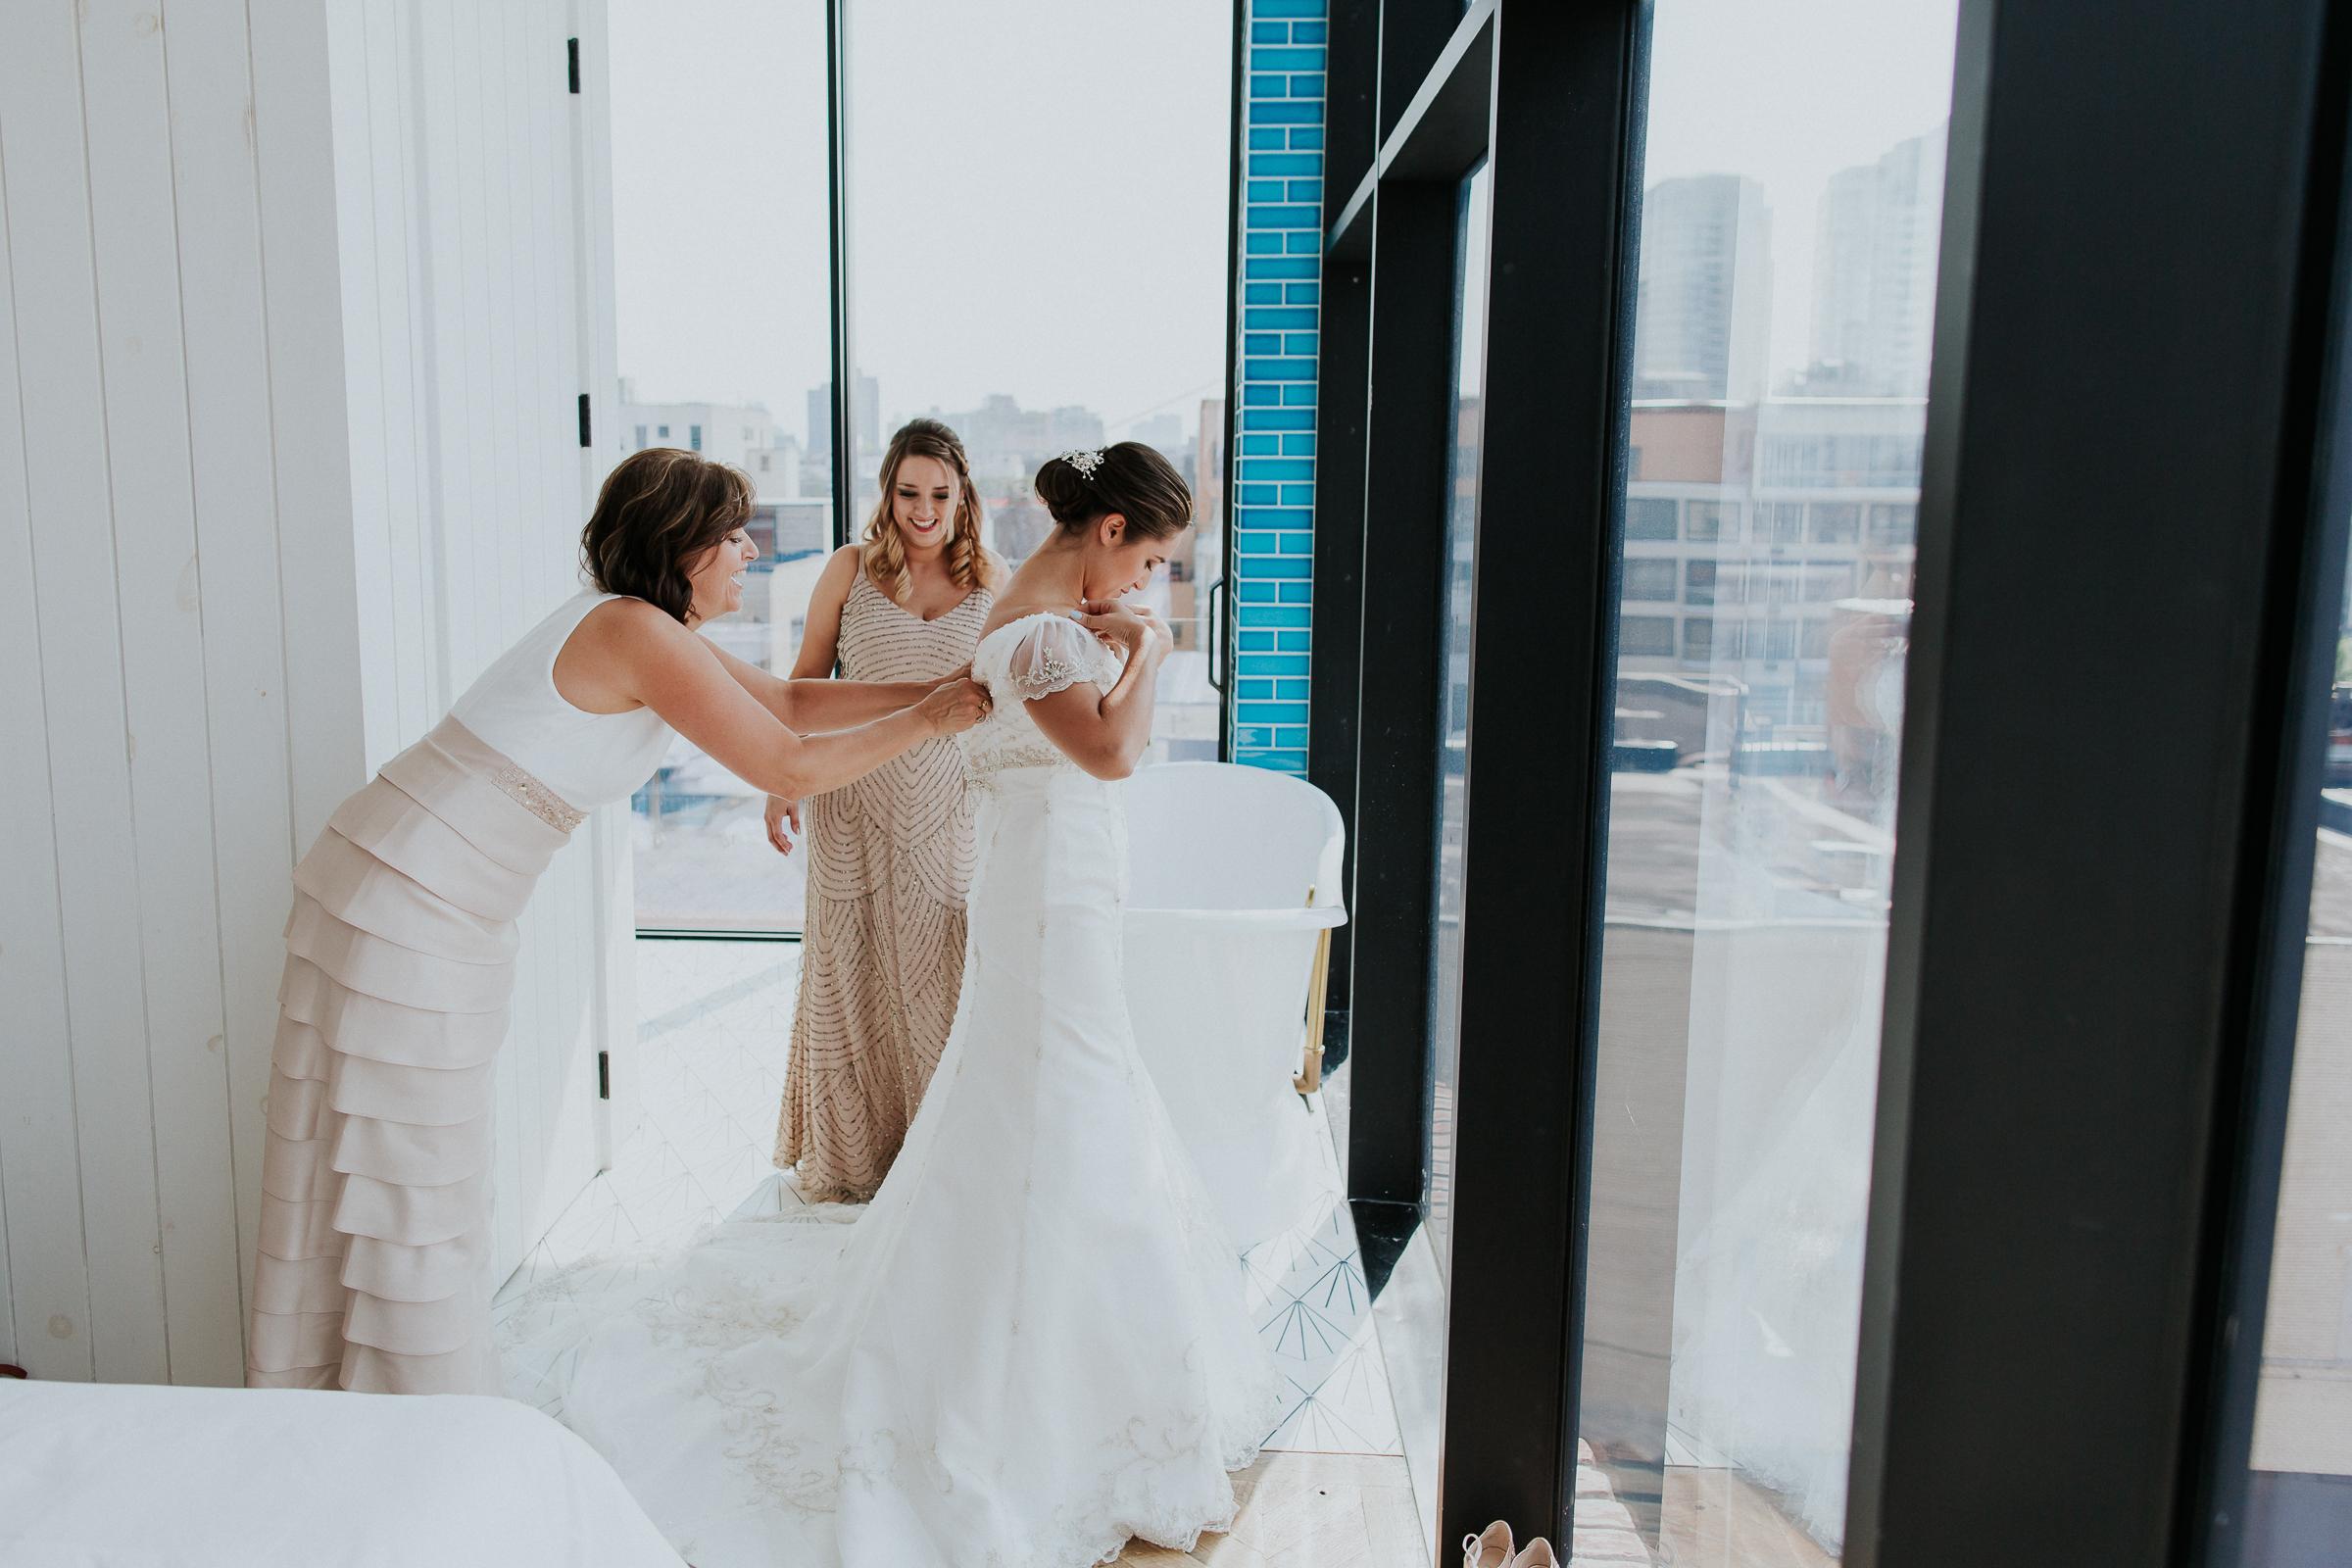 Brooklyn-Winery-NYC-Editorial-Documentary-Wedding-Photographer-Gina-Oli-10.jpg